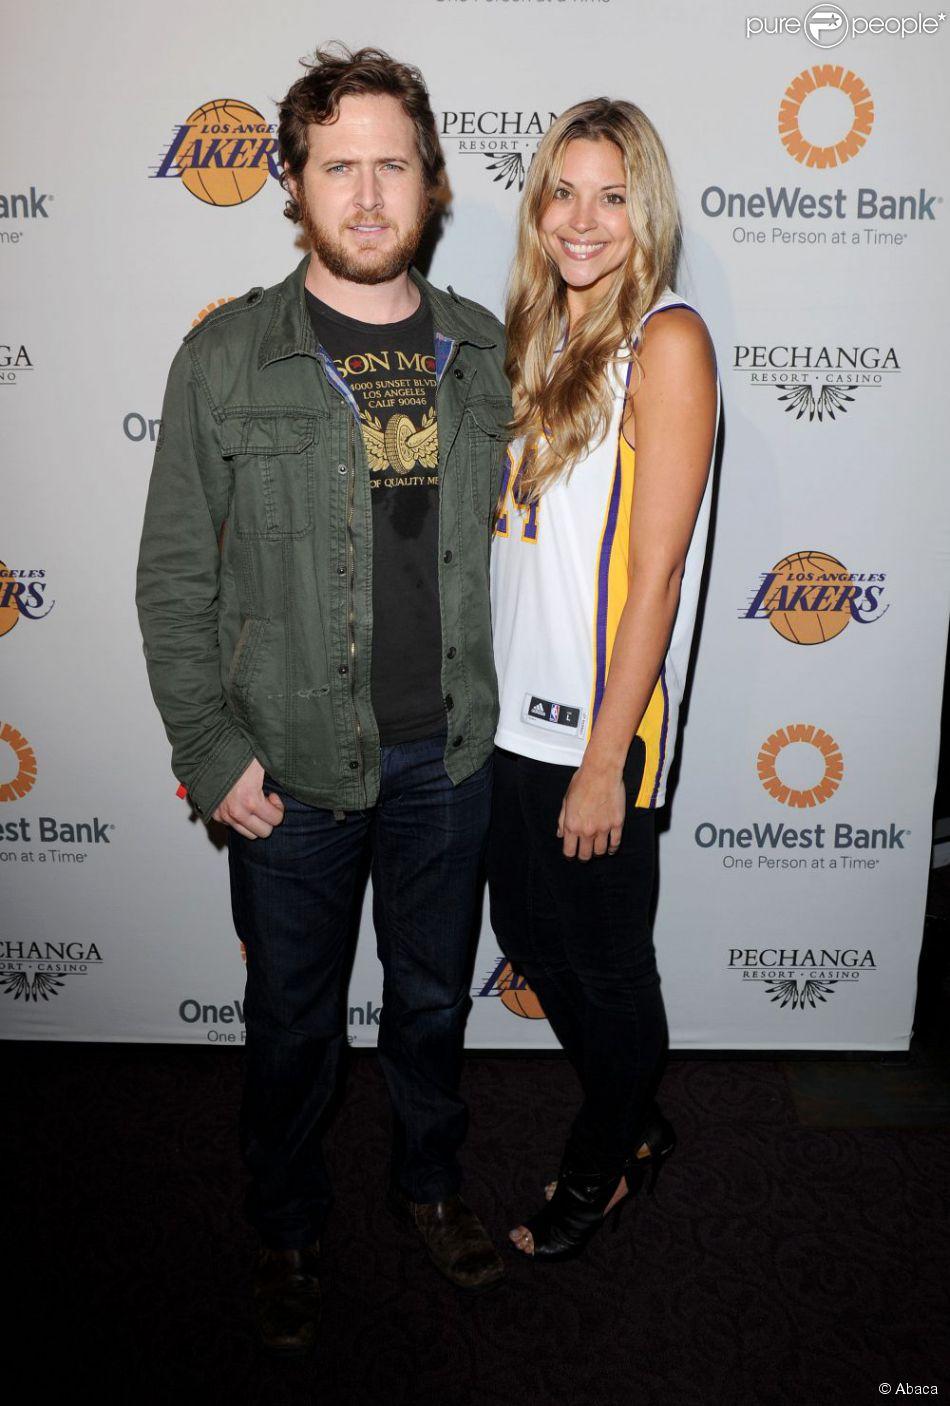 A.J. Buckley et sa fiancée Abigail Ochse en avril 2011 à Los Angeles